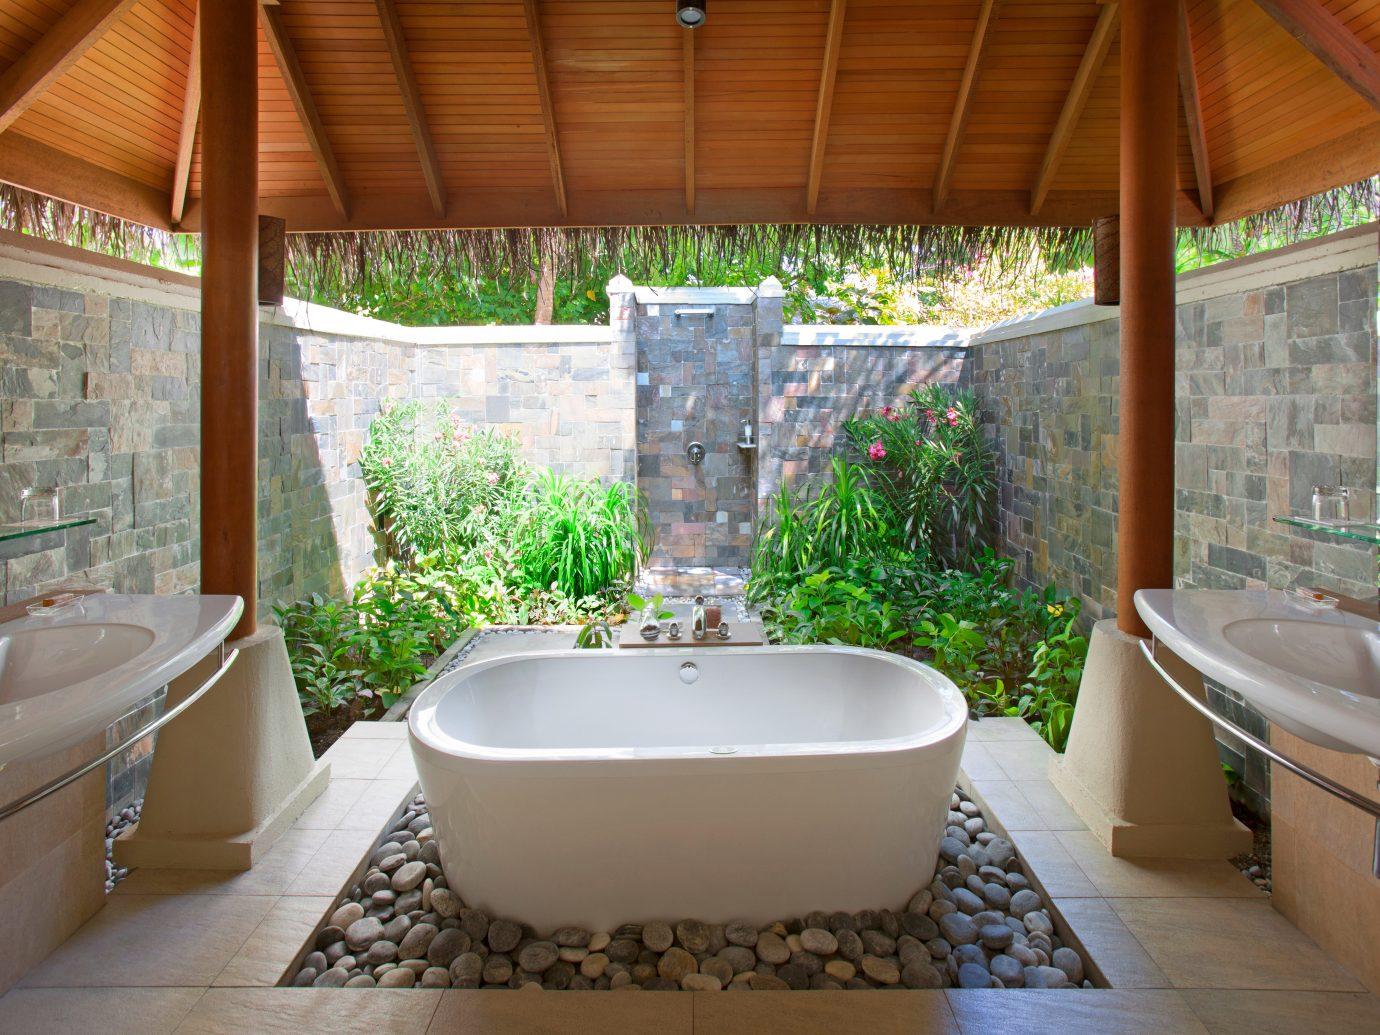 Outdoor bathtub at Baros Maldives